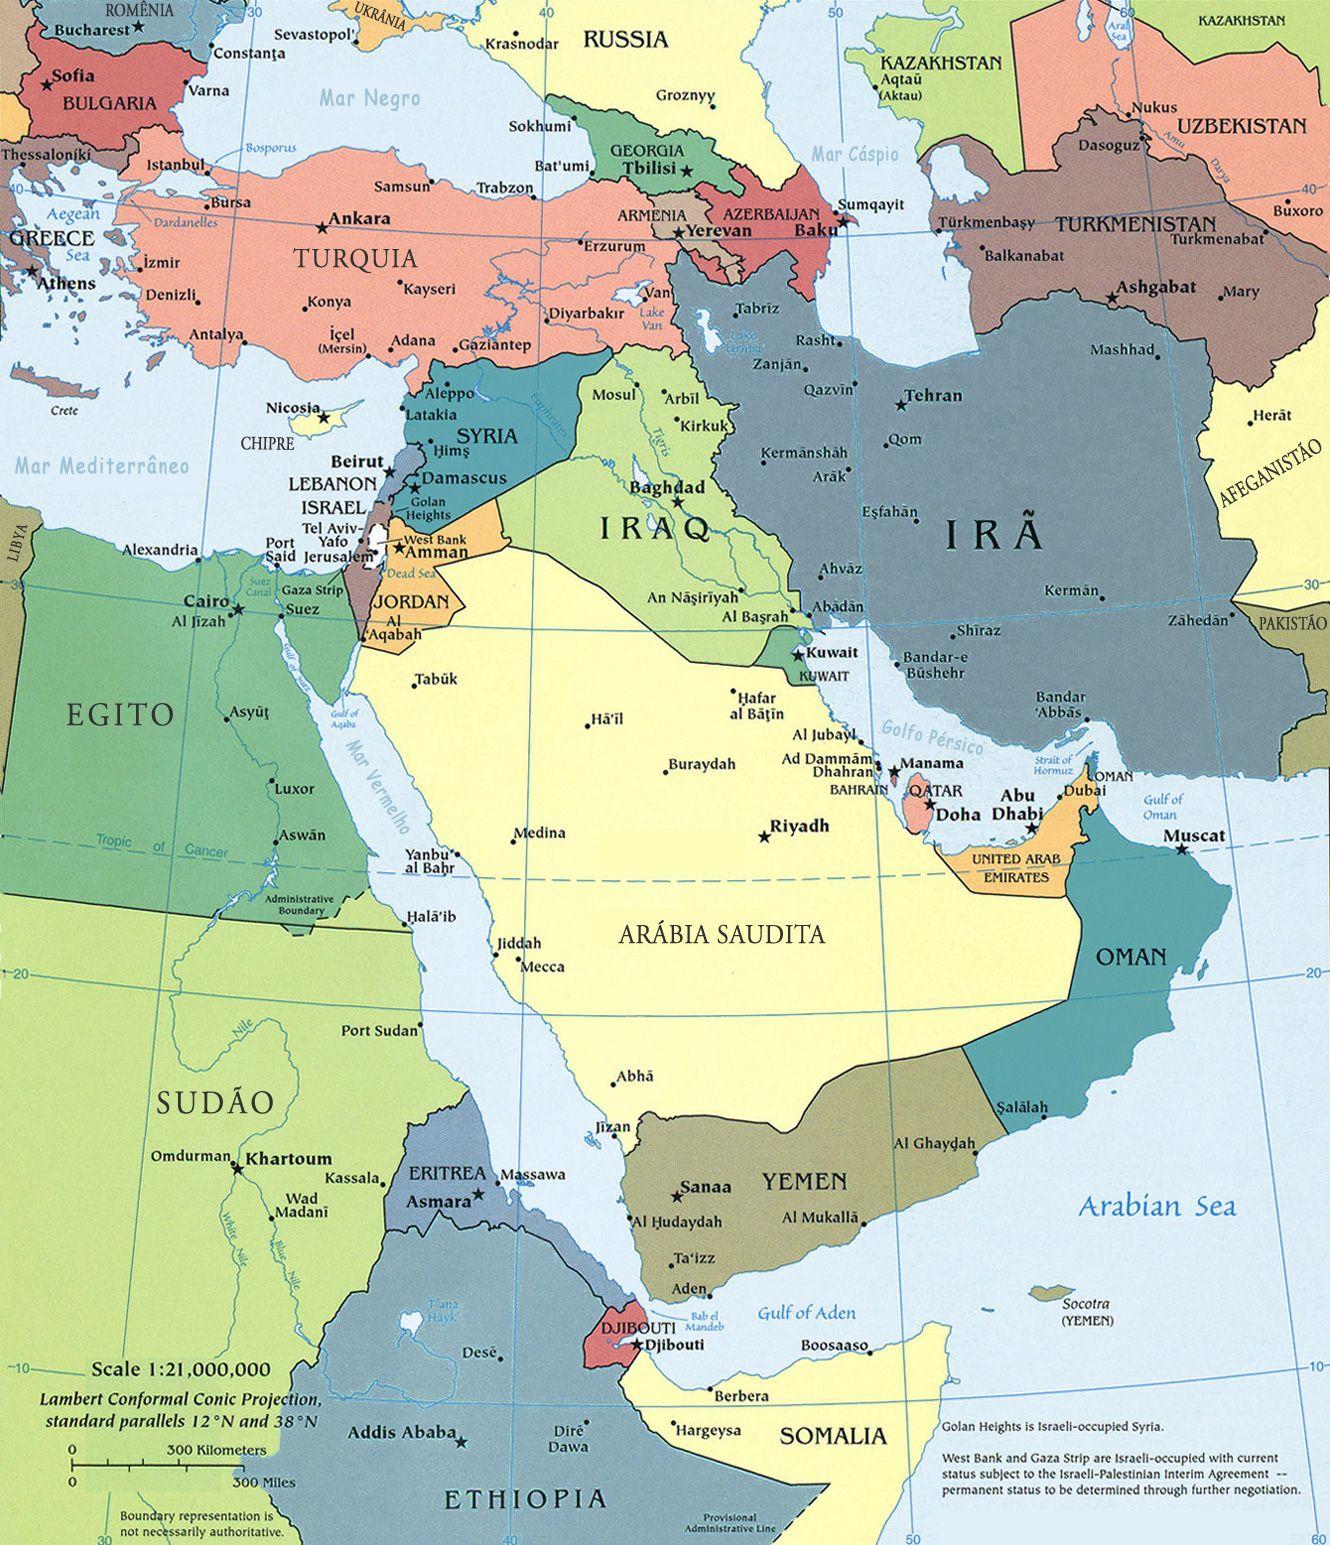 mapa oriente medio Mapa do Oriente Médio | Восток | Pinterest | Middle east mapa oriente medio